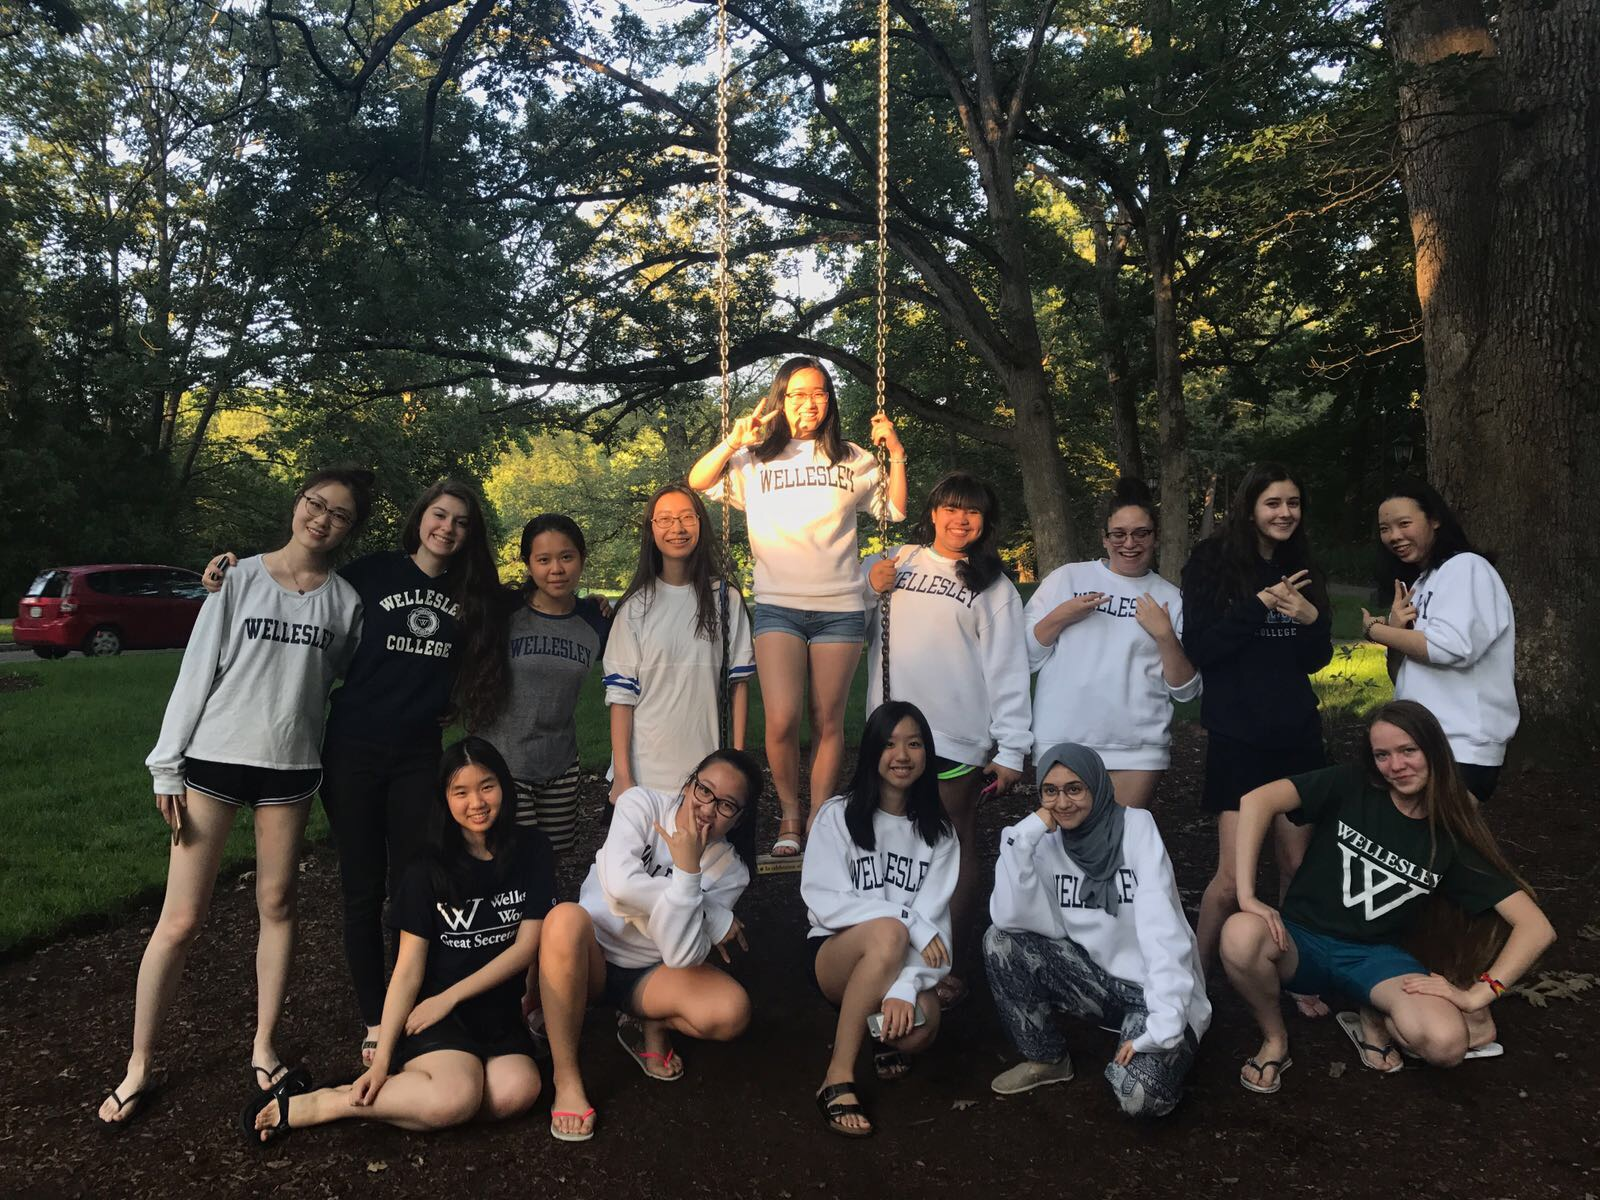 Summer Program - Golf | Wellesley Pre-College Sports Leadership Exploratory Workshops